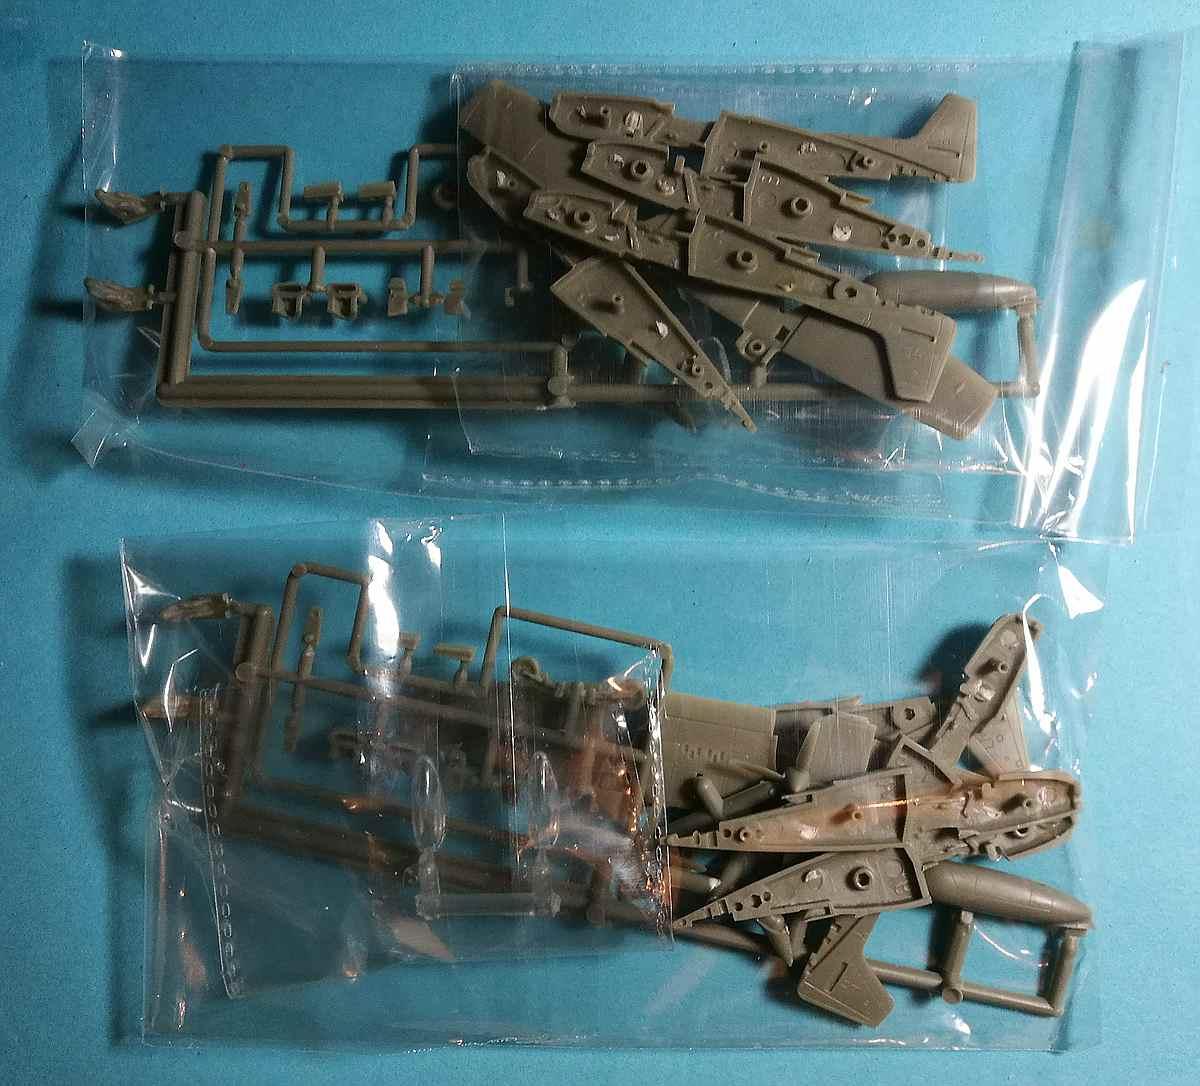 Platz-FC-3-Twin-Mustang-1zu144-8 Twin Mustang in 1:144 von Platz FC-3